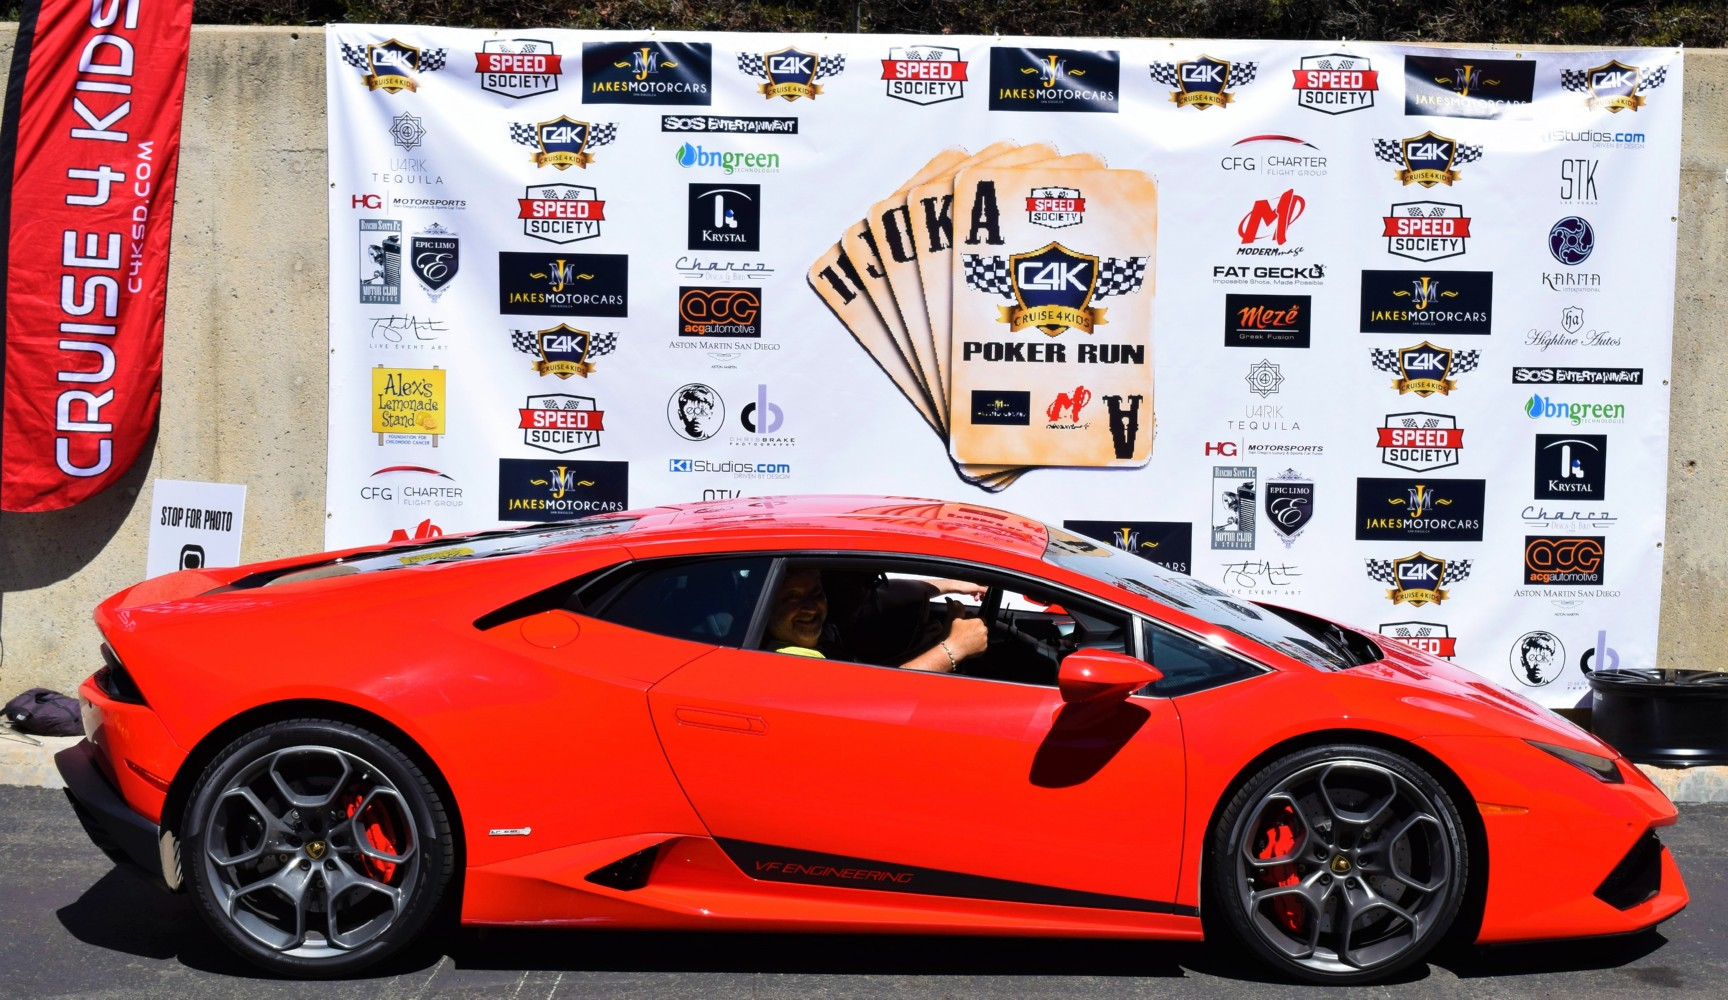 Poker Run 2017 Banner Photos - 17.jpg